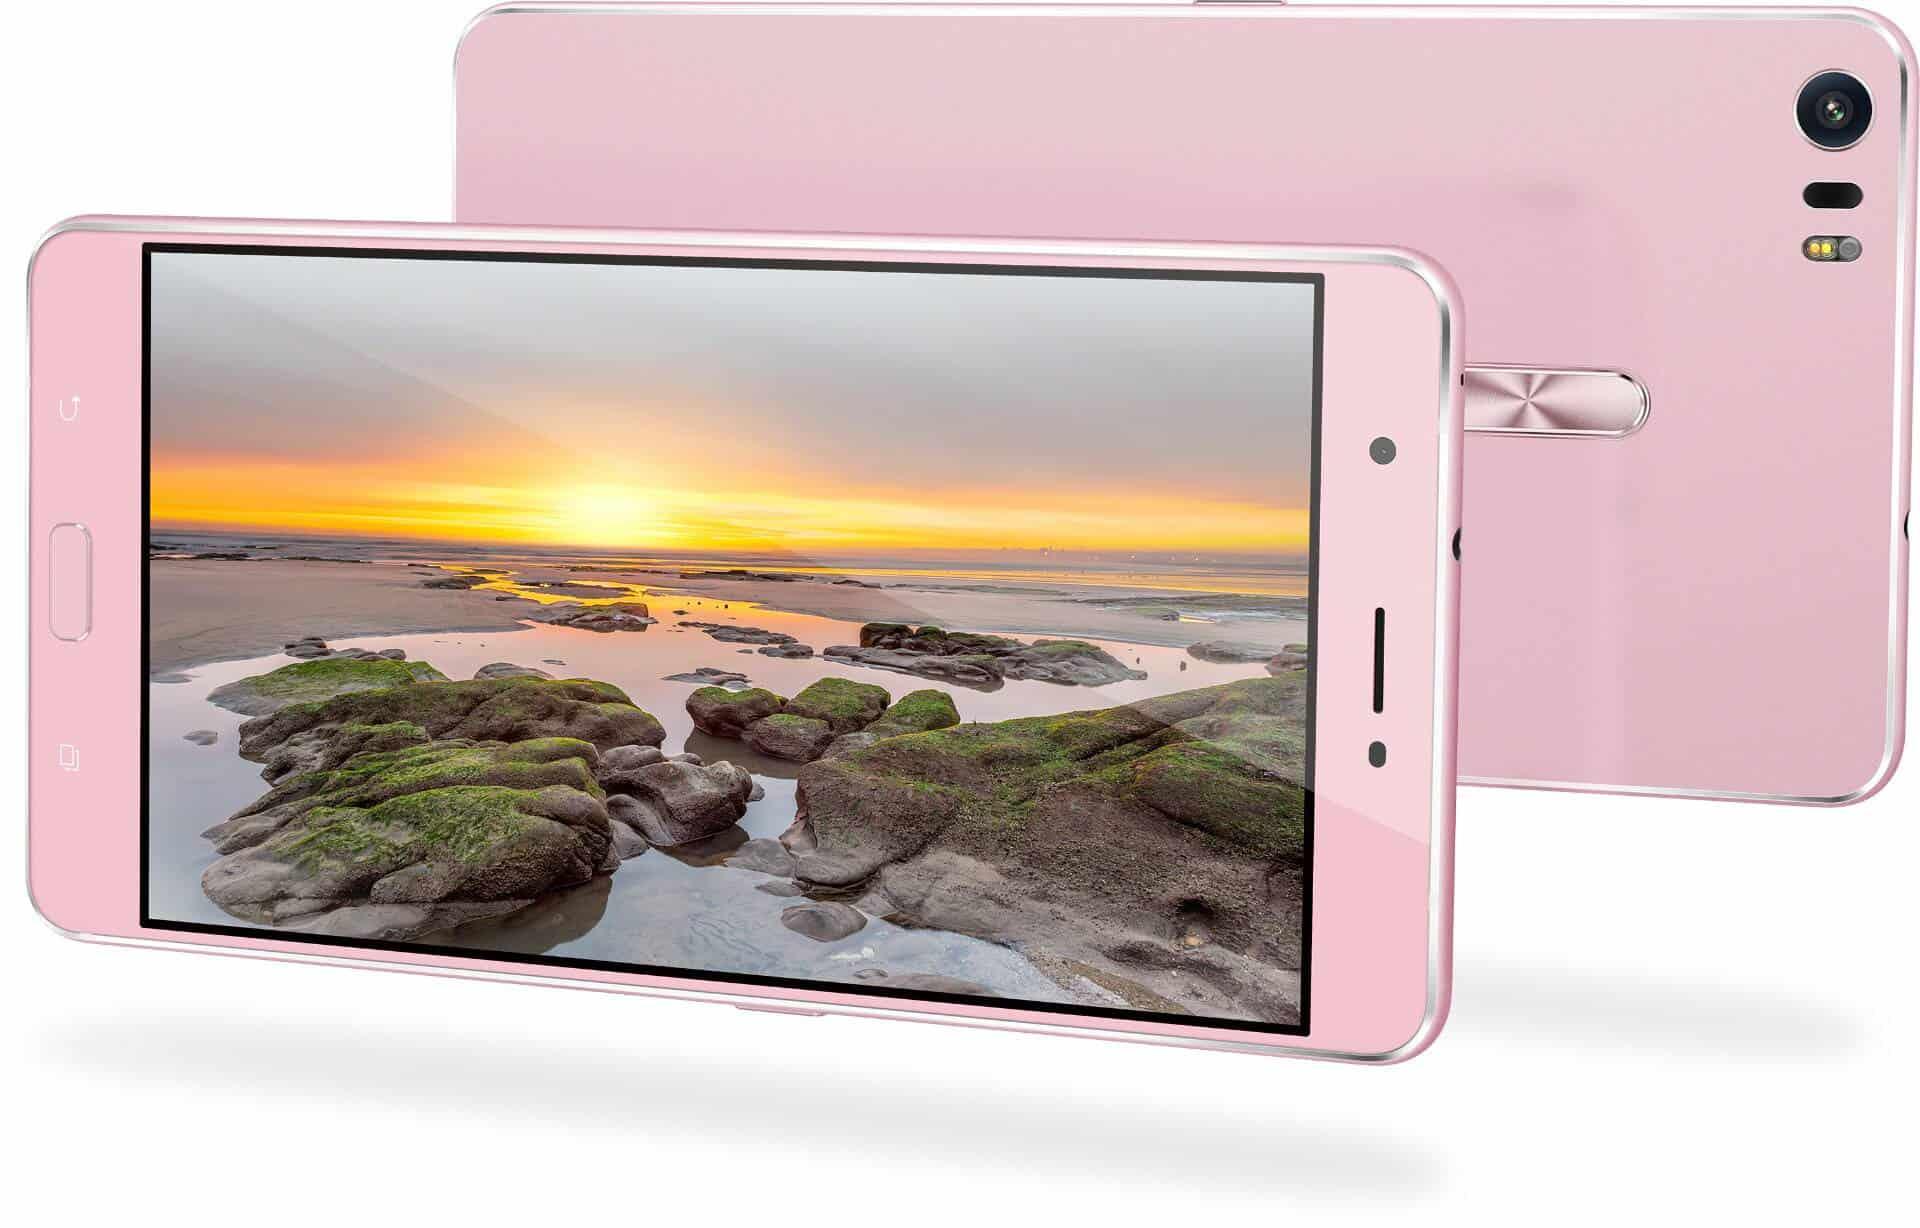 ASUS ZenFone 3 Ultra 8